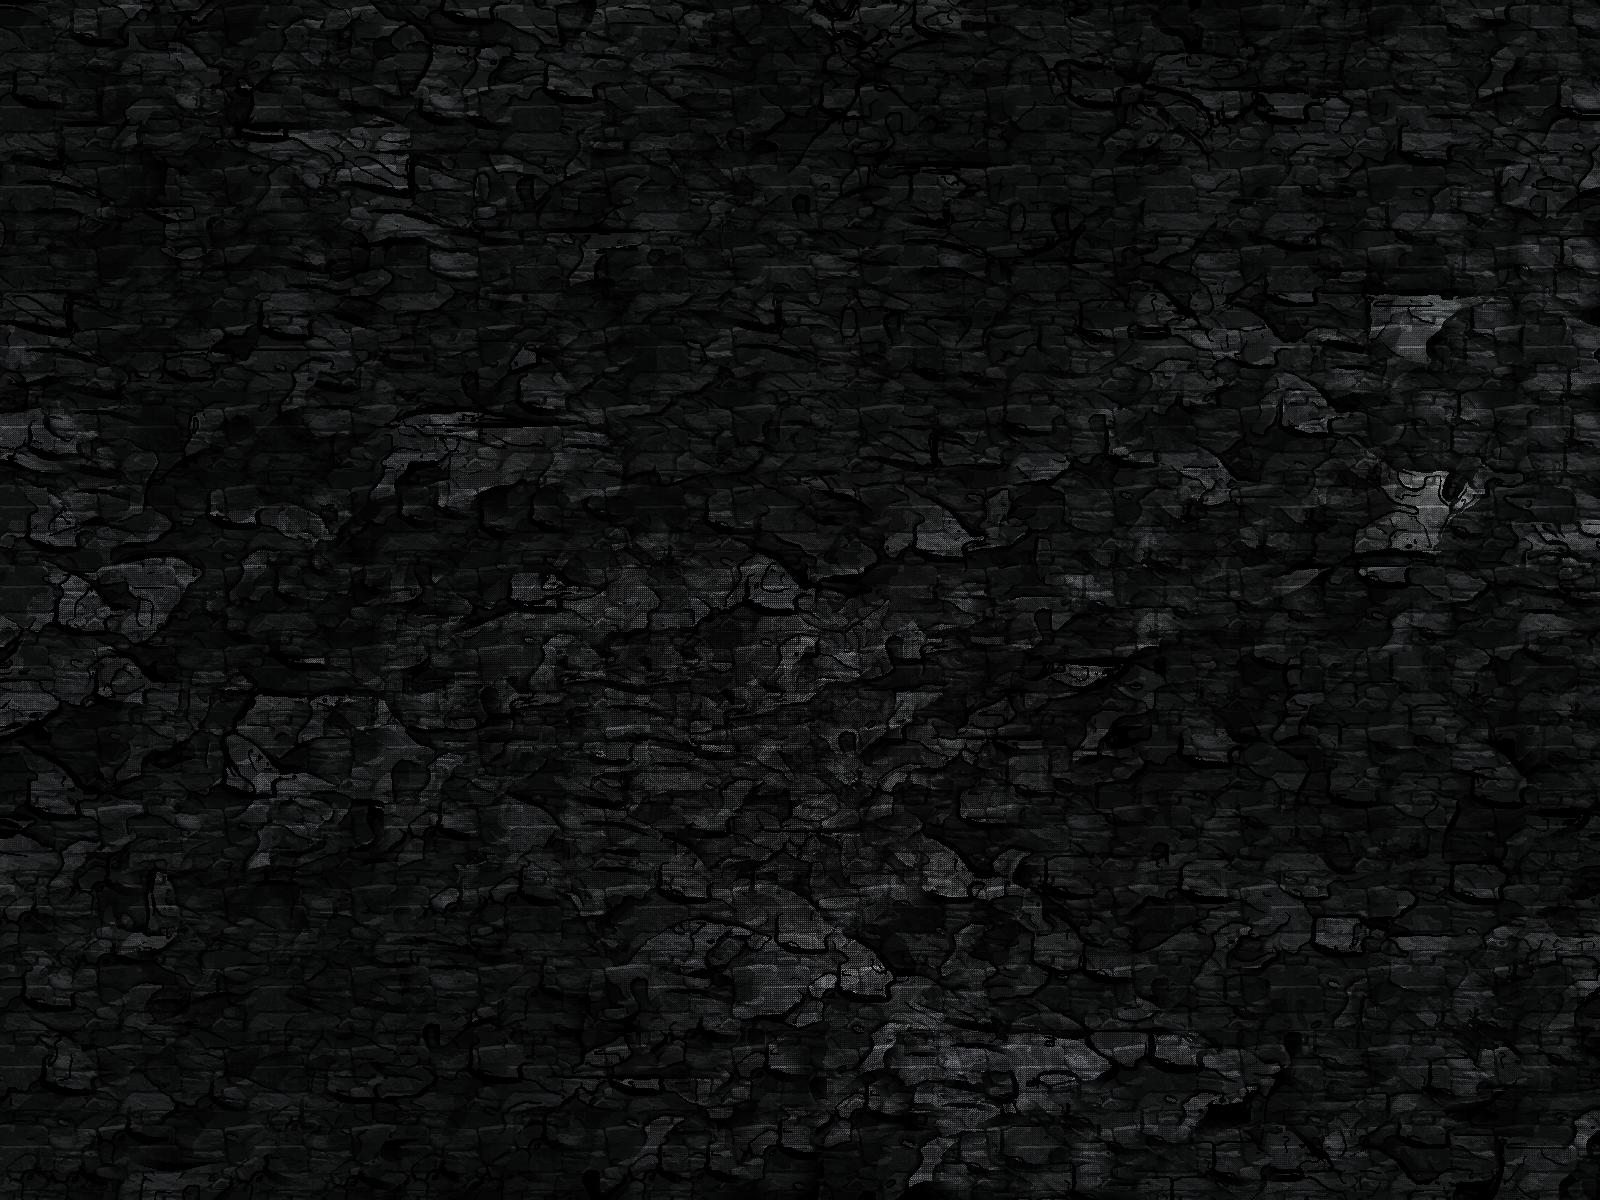 wallpapers, free wallpapers,. gpl wallpapers, JJ Posti wallpapers